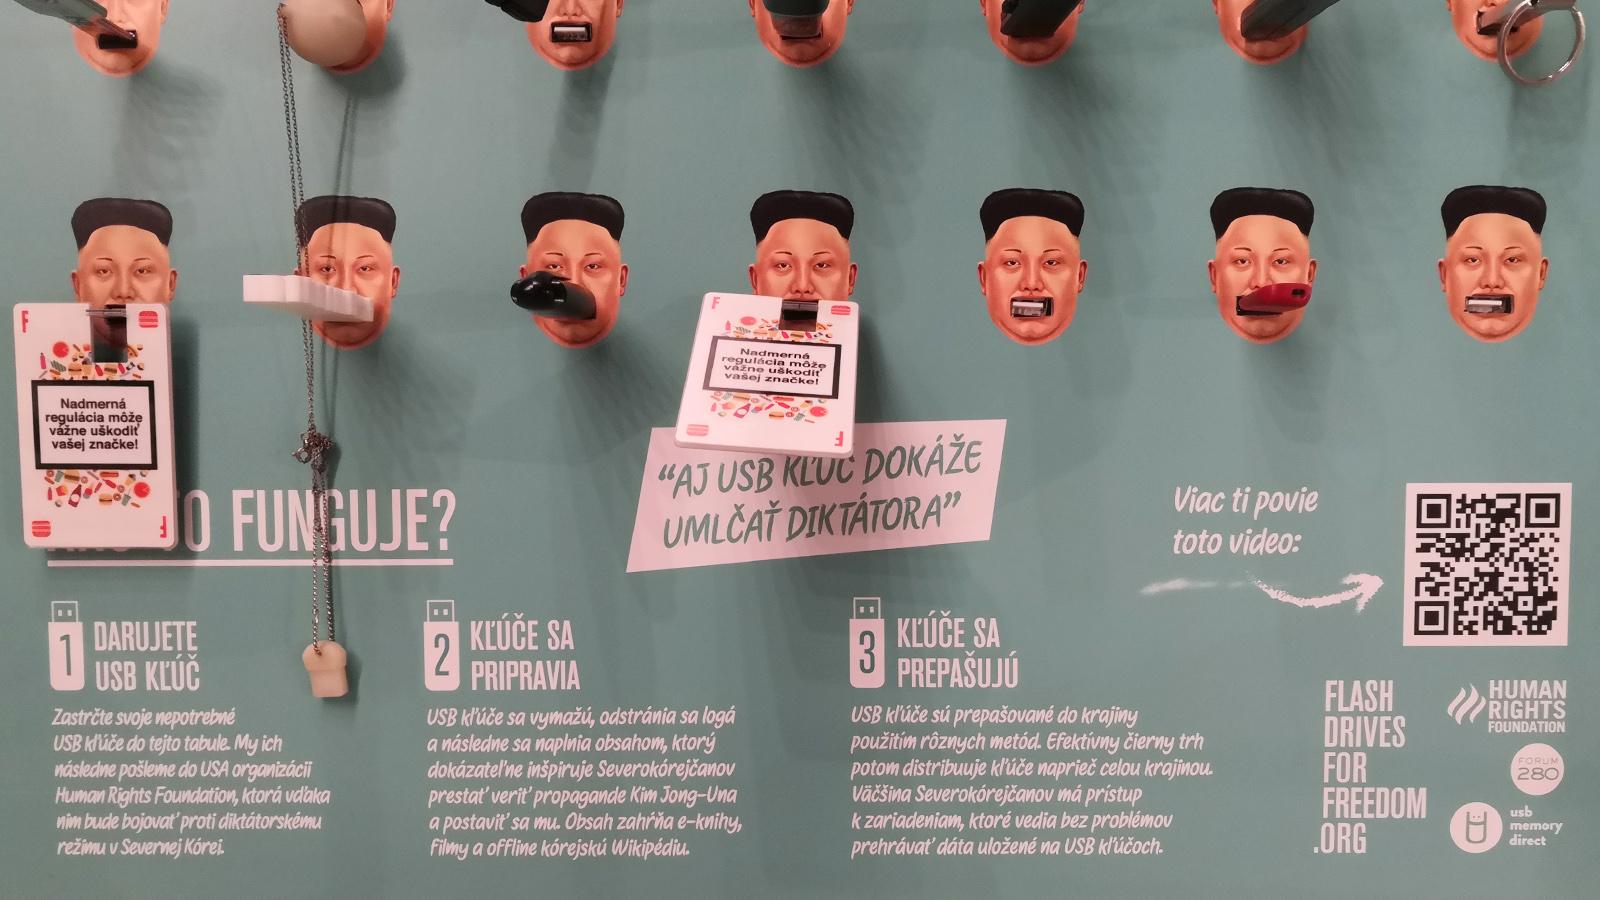 Human Rights - Svoboda v Severní Korei Mini Maker Faire Bratislava